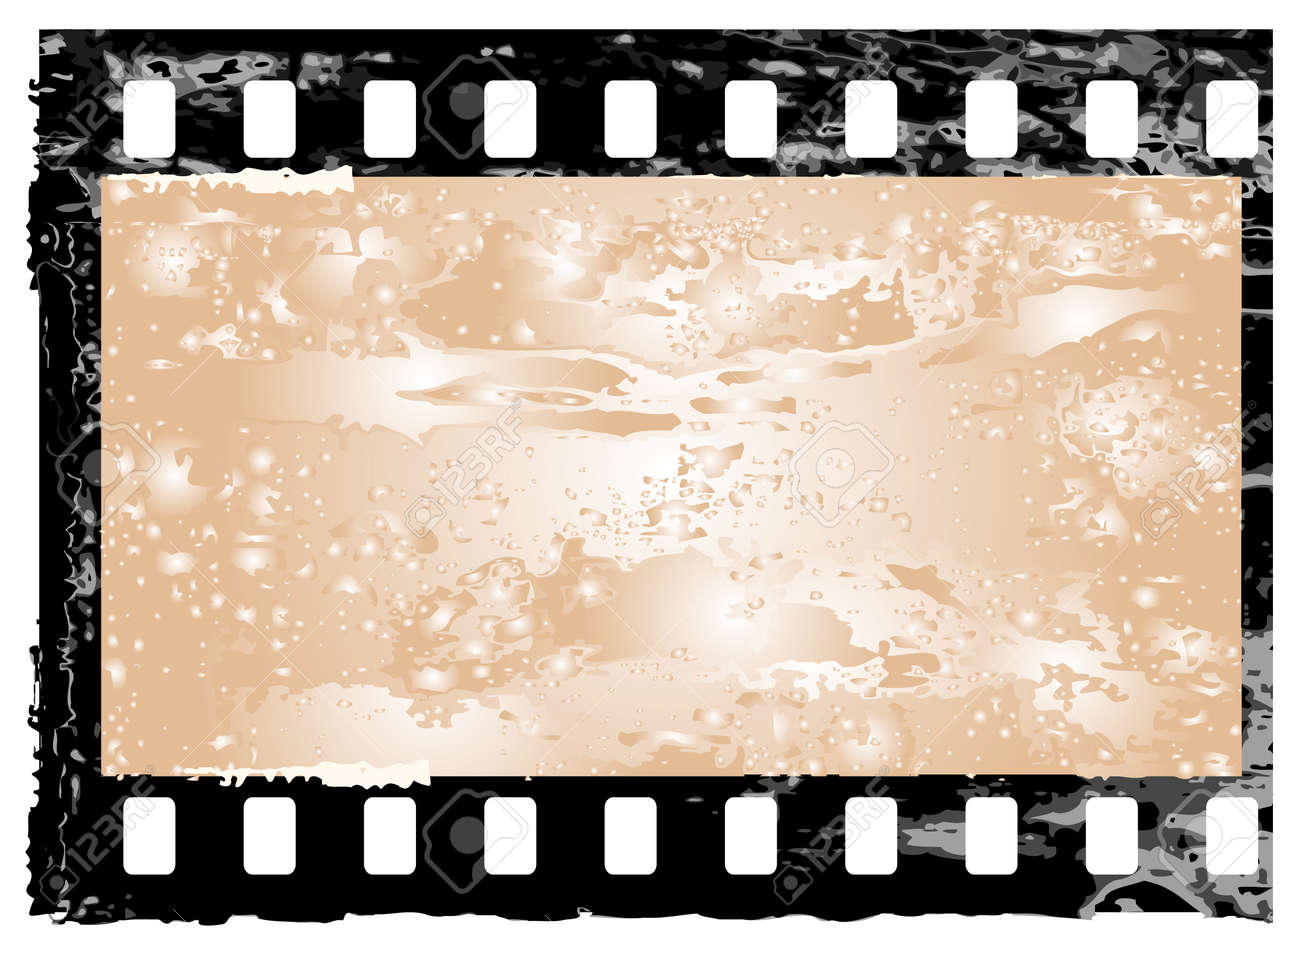 Aged Vector Illustration Of A Grunge Filmstrip Frame. Royalty Free ...